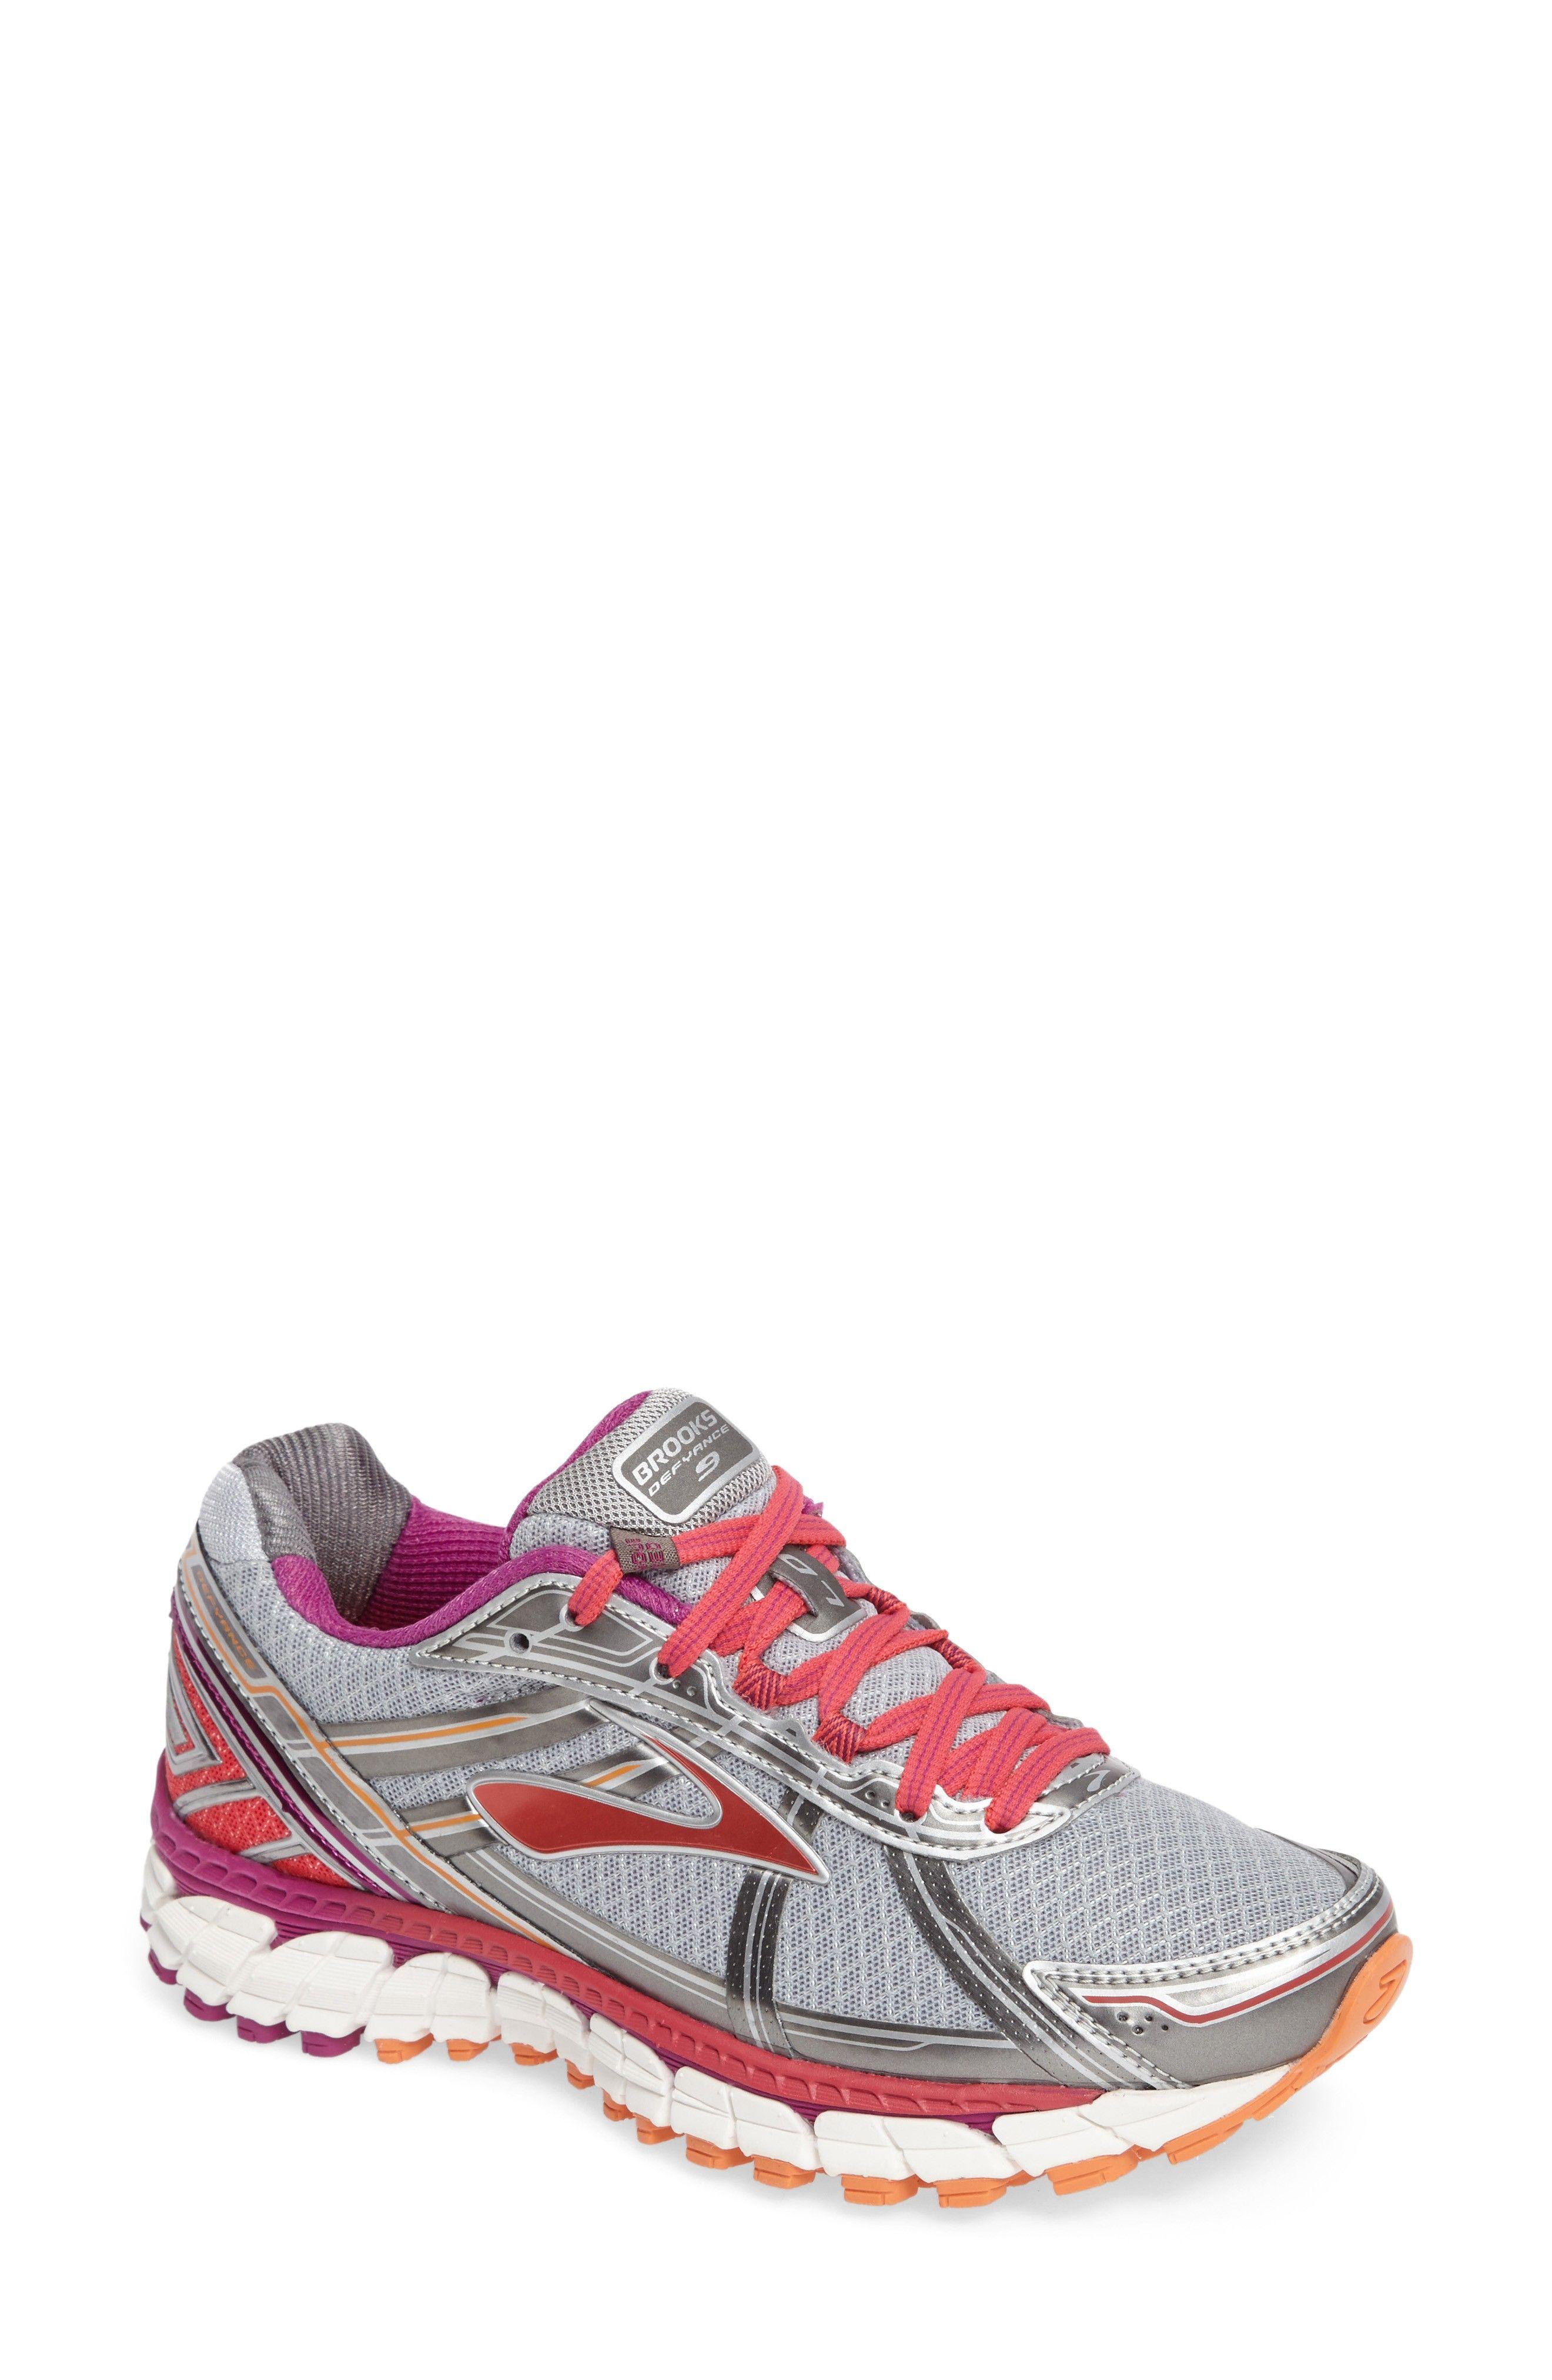 2492c334108d8 New BROOKS Defyance 9 Running Shoe online. New BROOKS Shoes.   89.95  SKU  BMPK41163NPQI52416